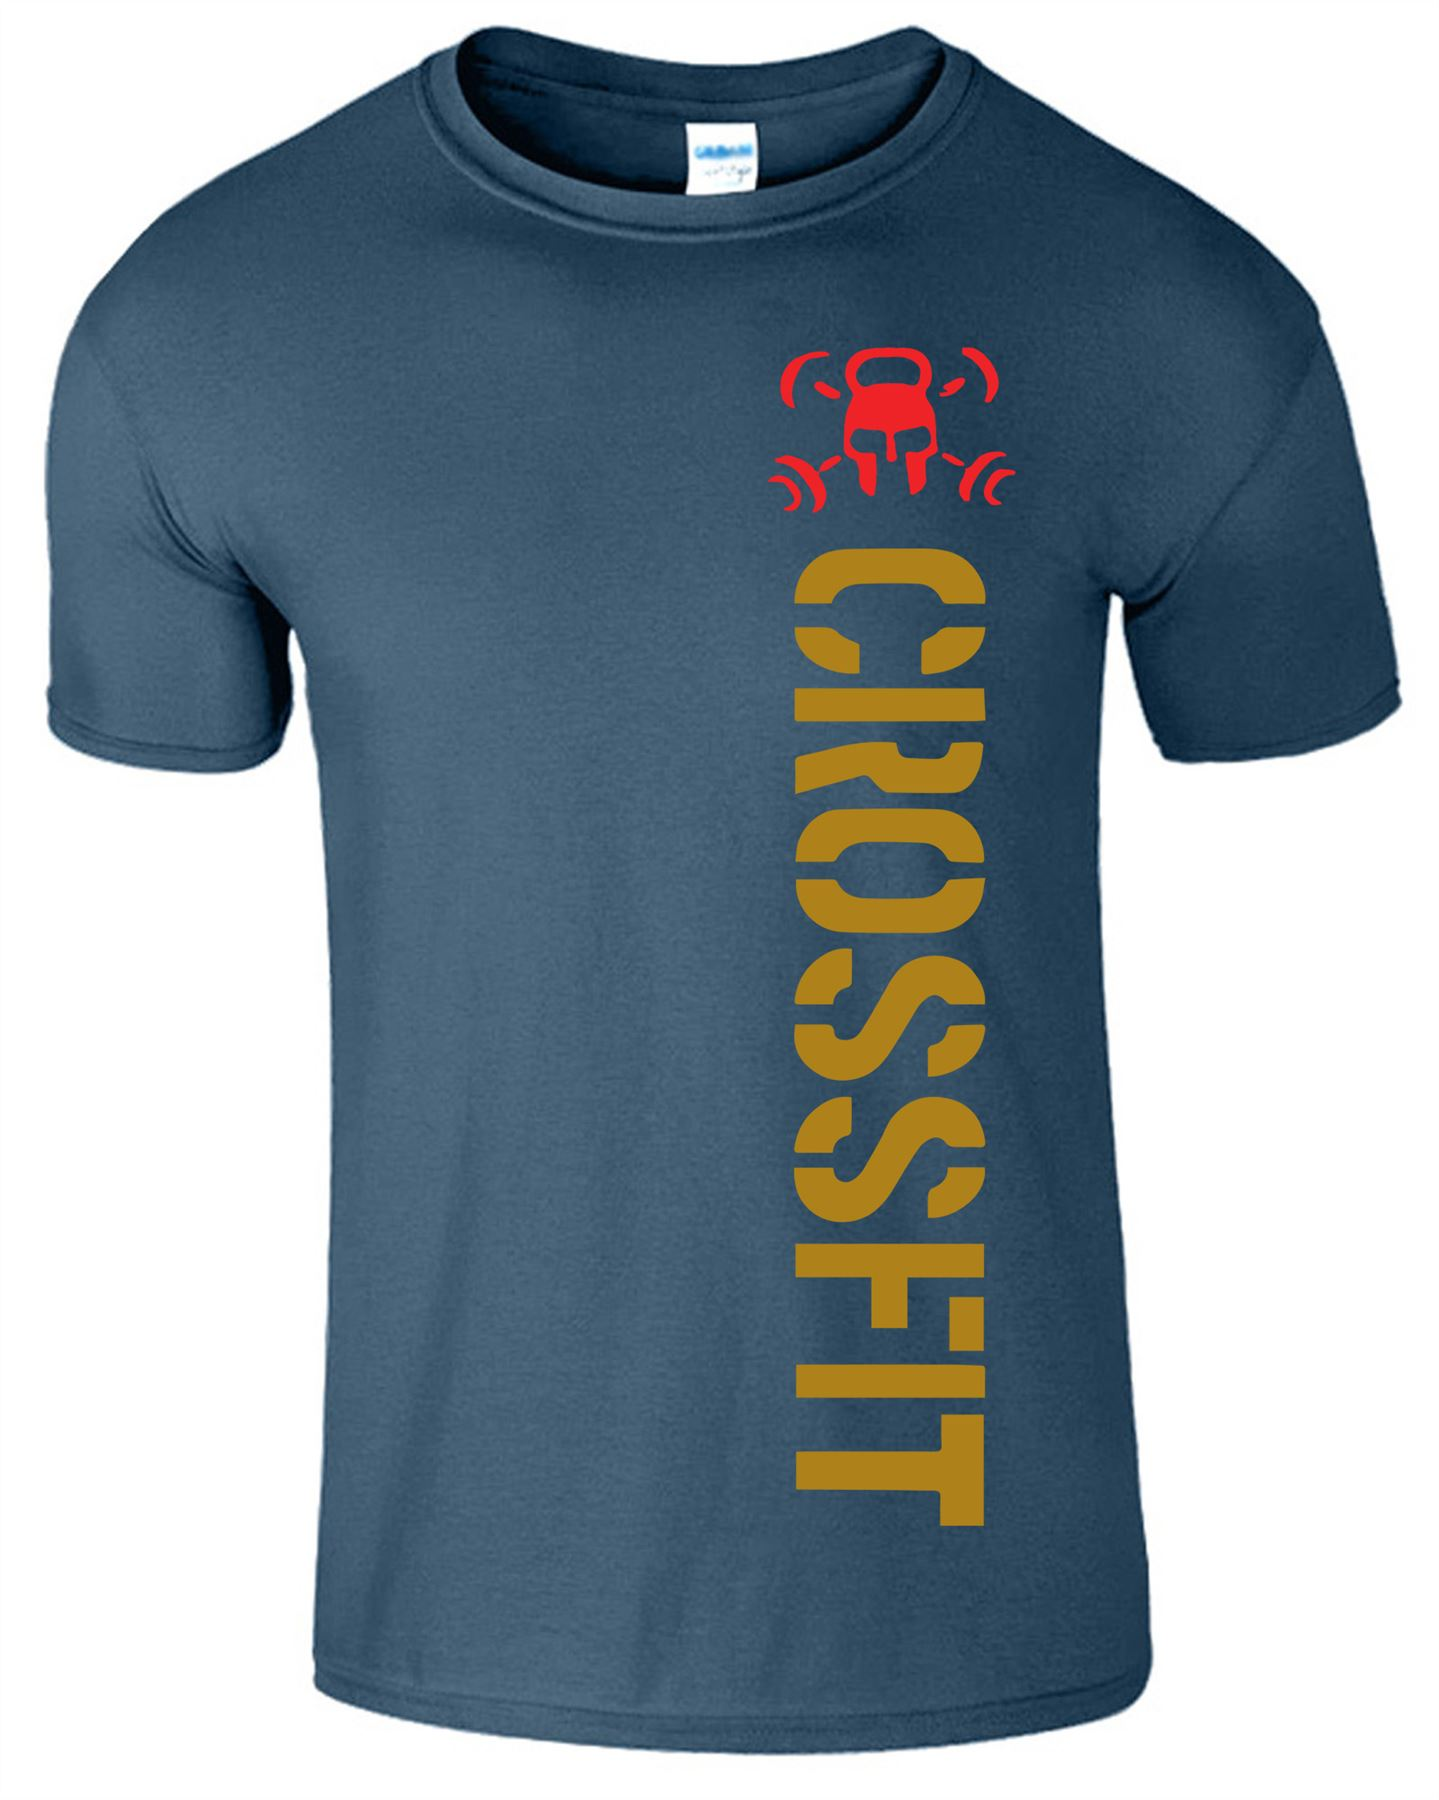 Crossfit-Mens-T-Shirt-Gym-Wear-Bodybuilding-Training-Workout-Fitness-T-Shirt Indexbild 11